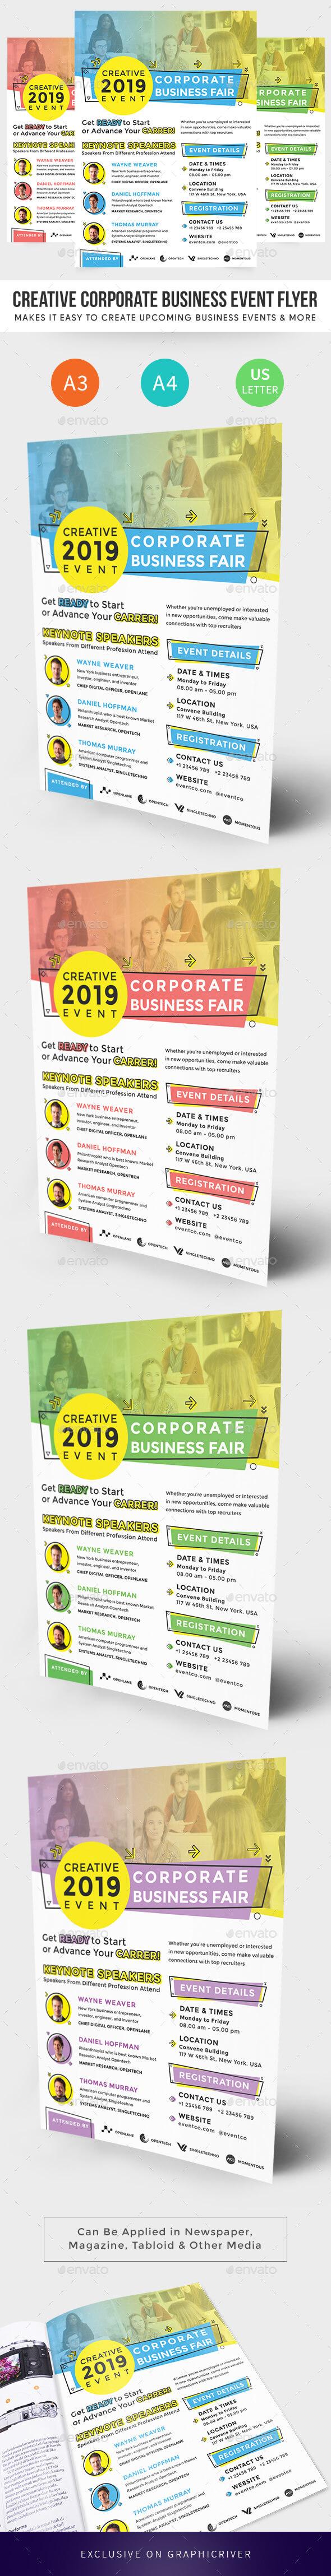 Creative Corporate Business Event Flyer - Corporate Flyers